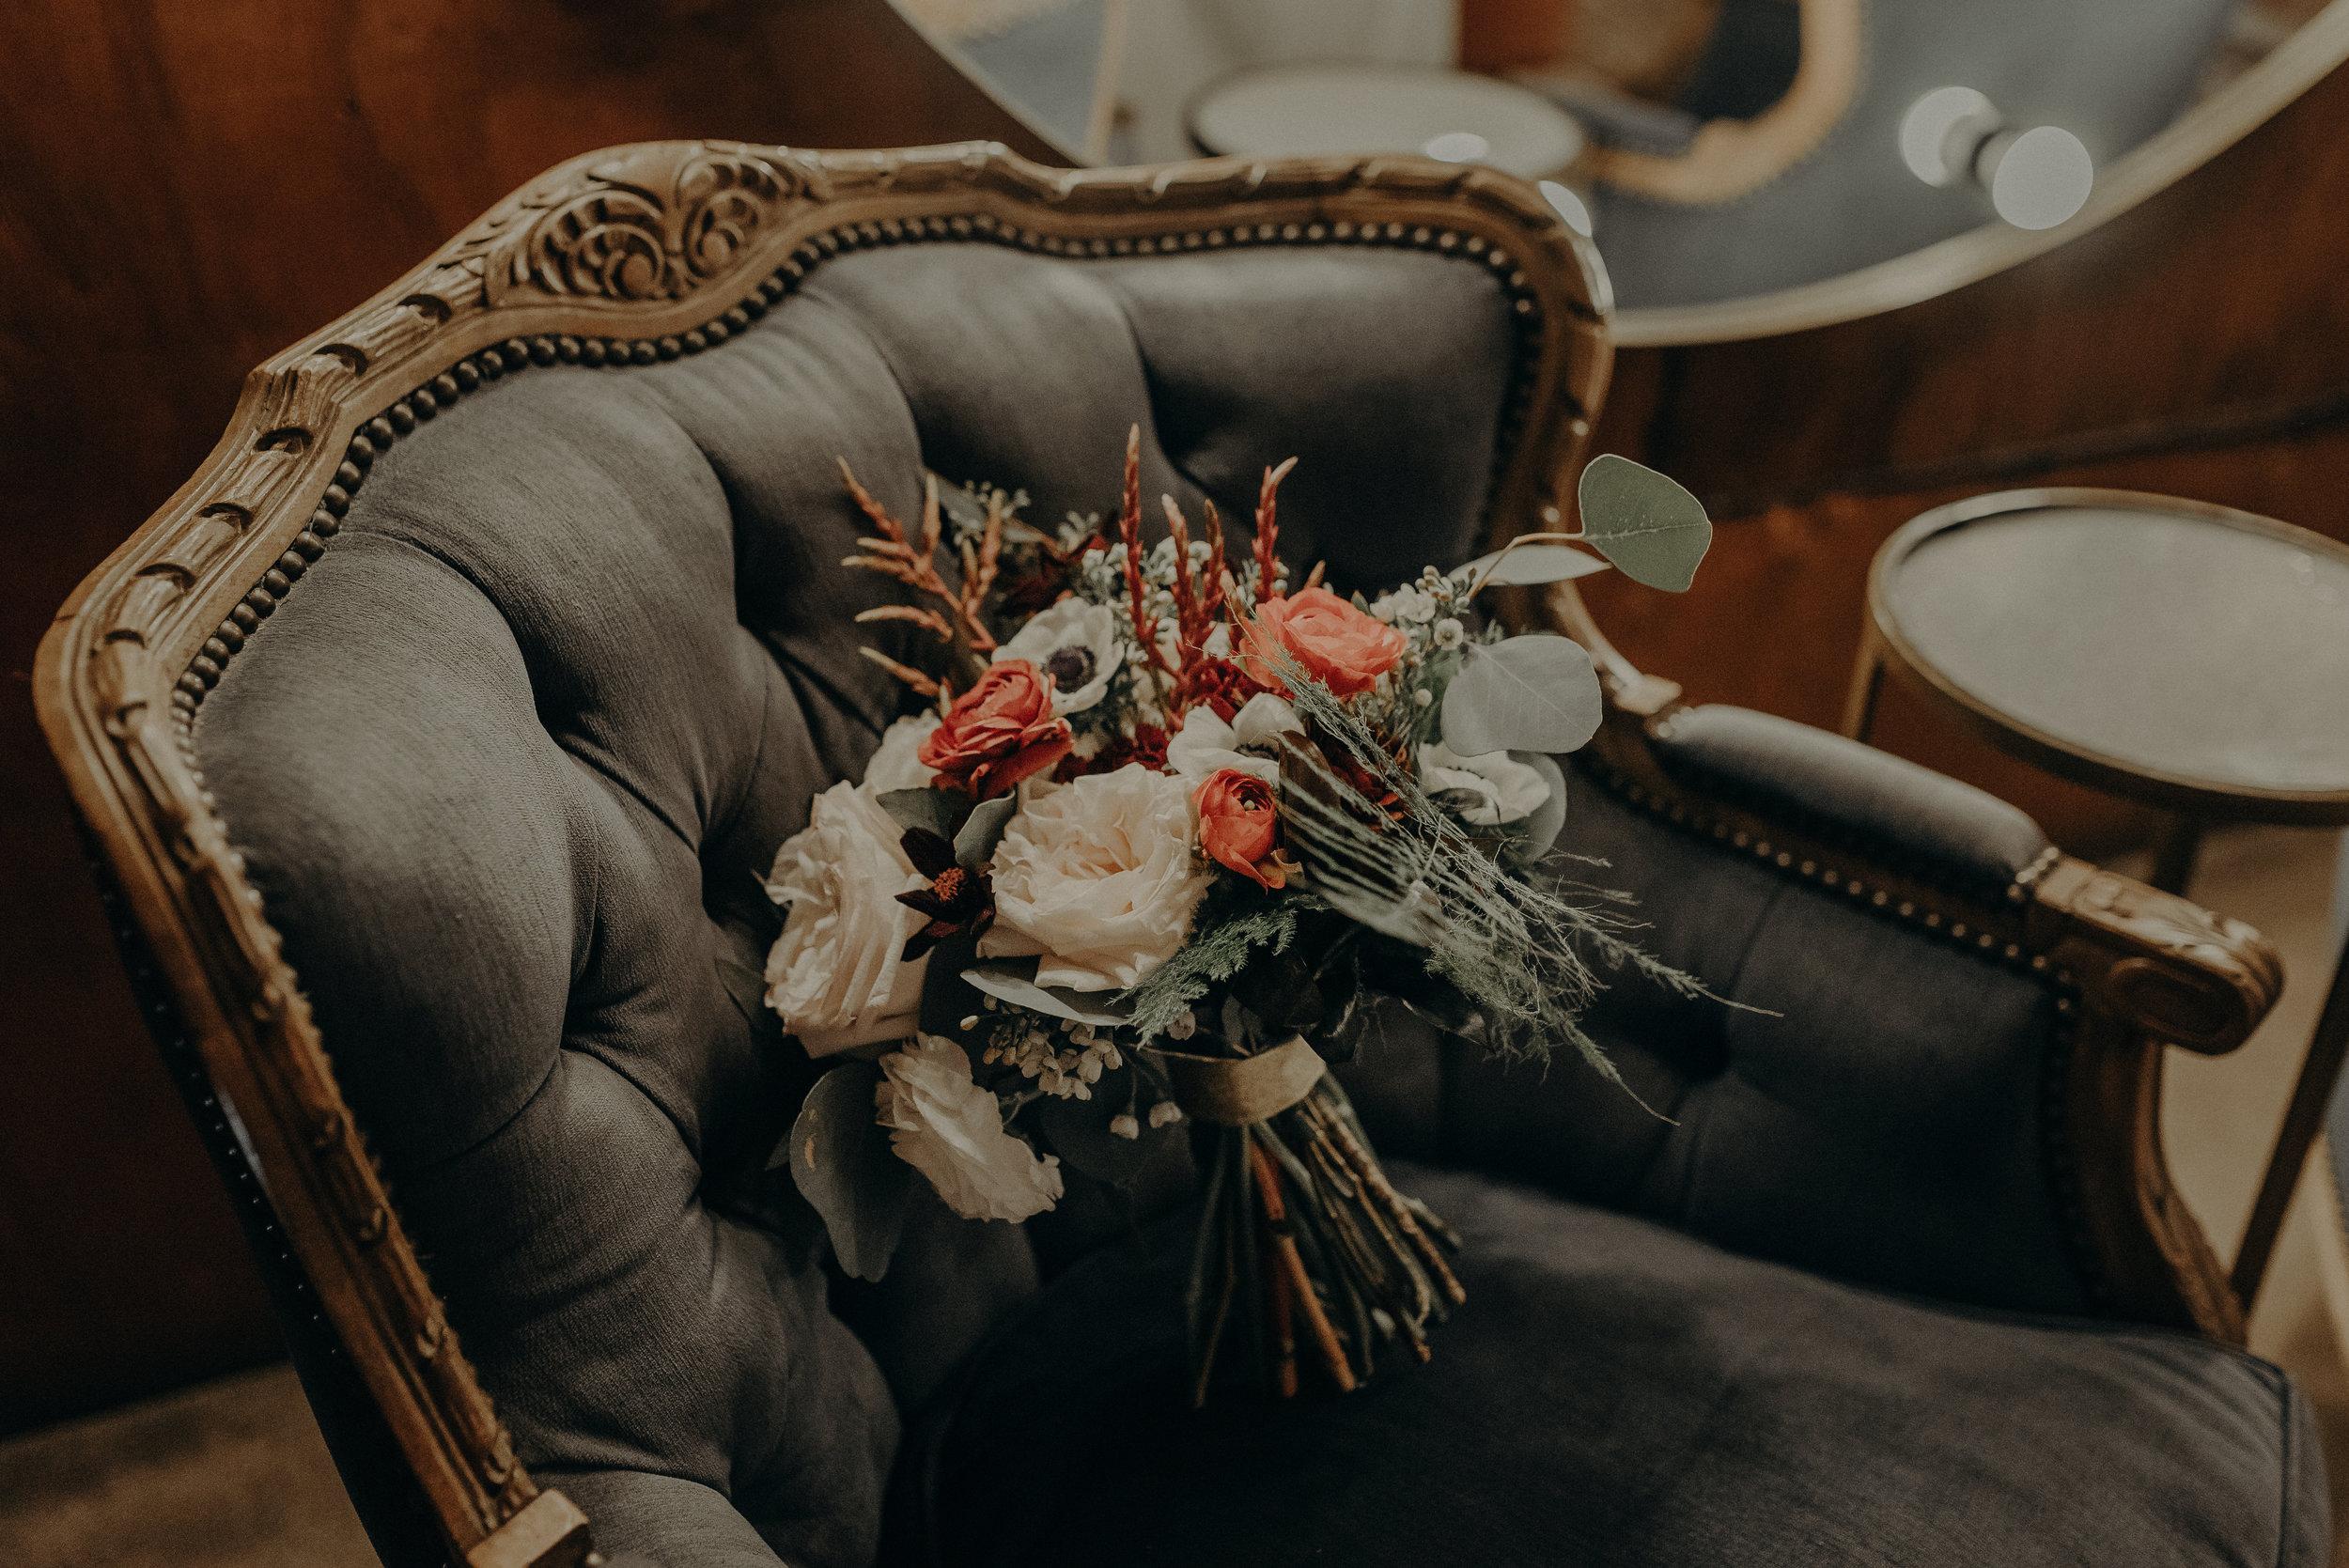 Isaiah + Taylor Photography - Reese + Jonathan Wedding-014.jpg